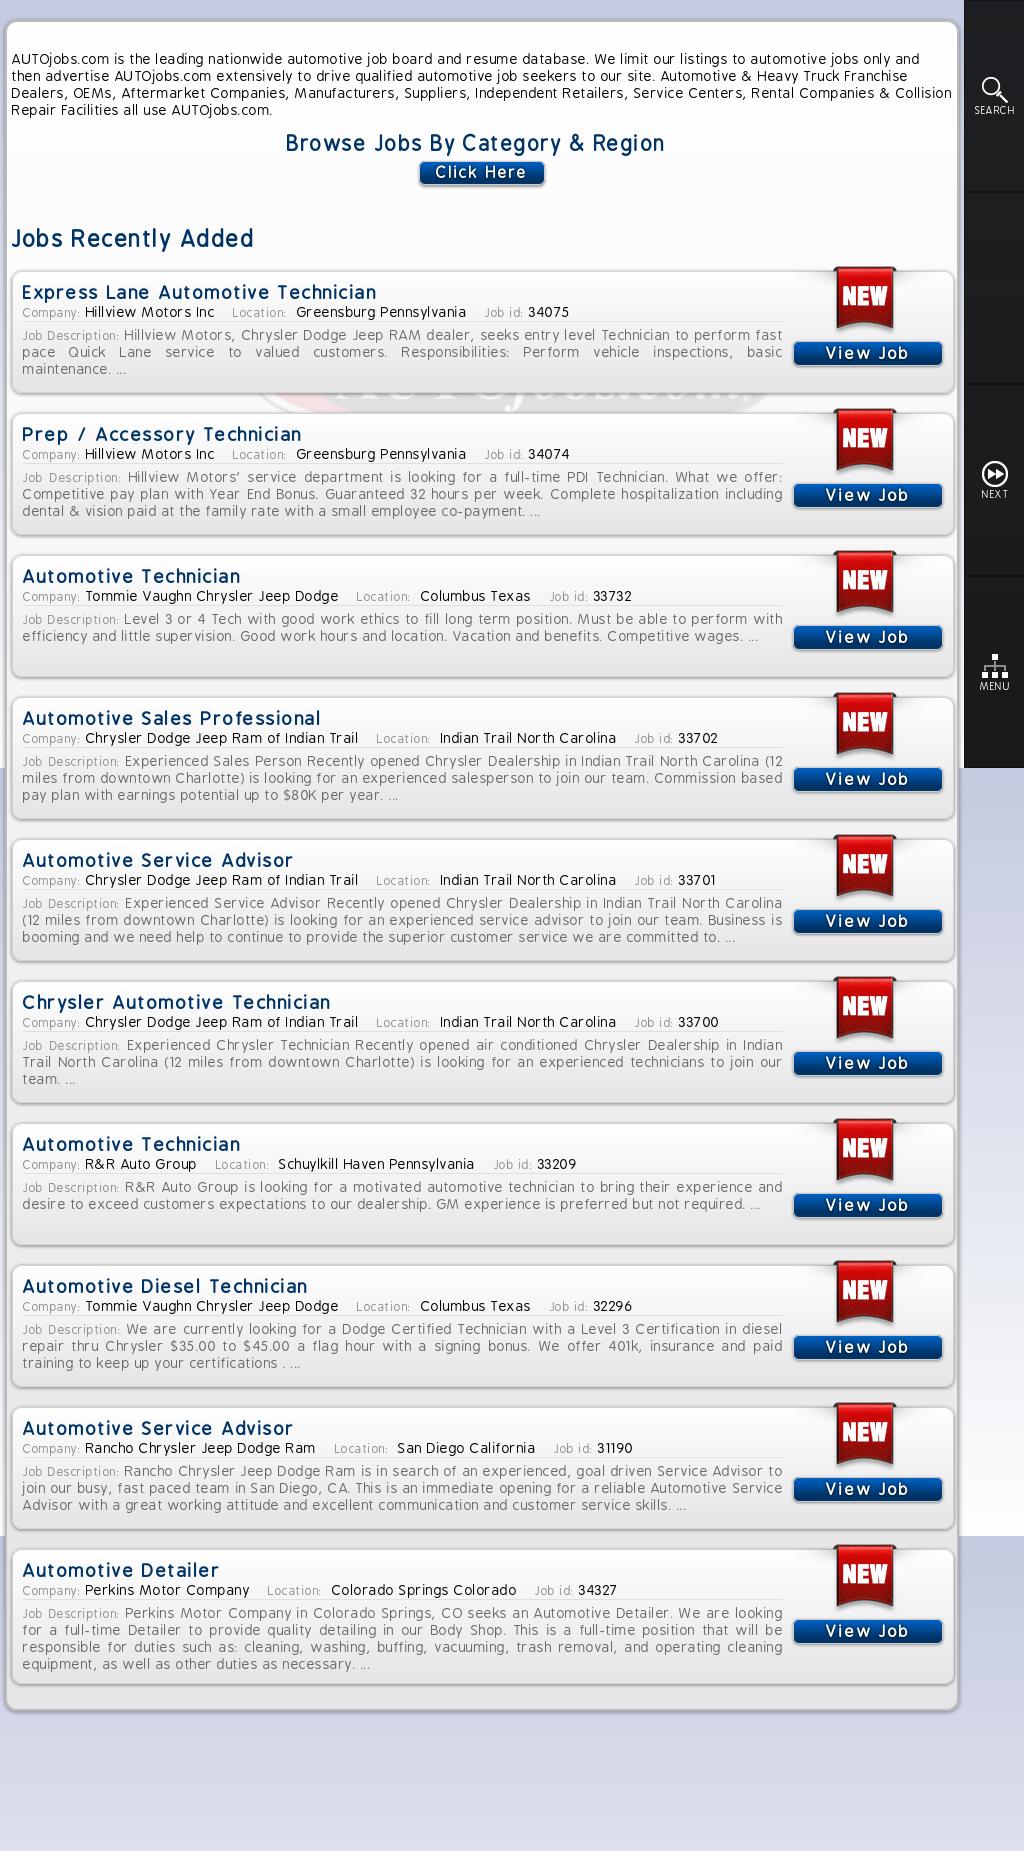 Autojobs Competitors, Revenue and Employees - Owler Company Profile